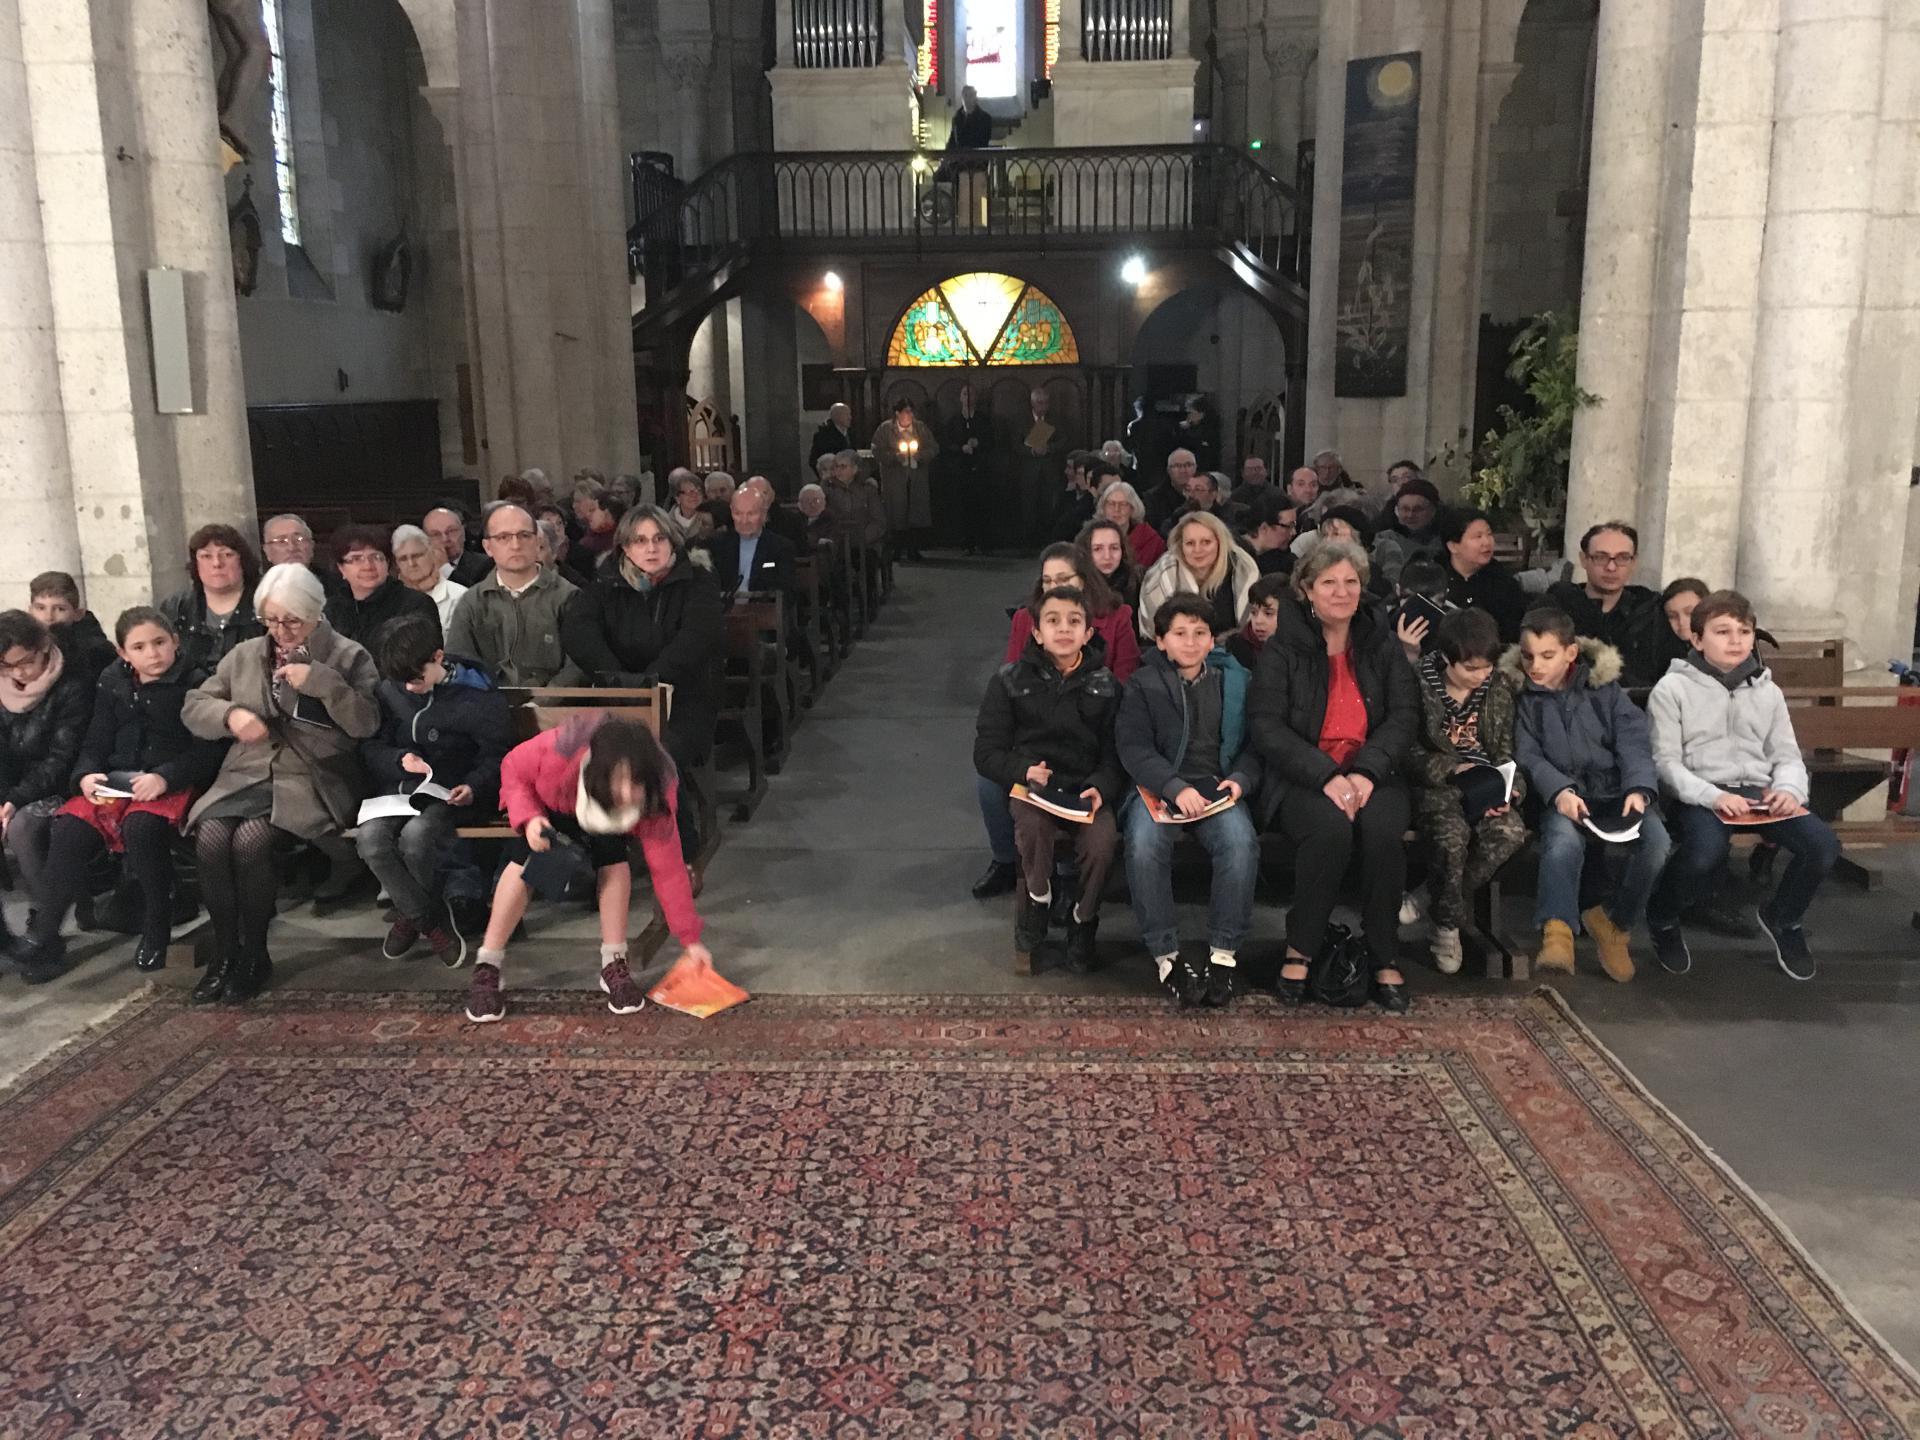 Visite pastorale eveque janvier 2018 5